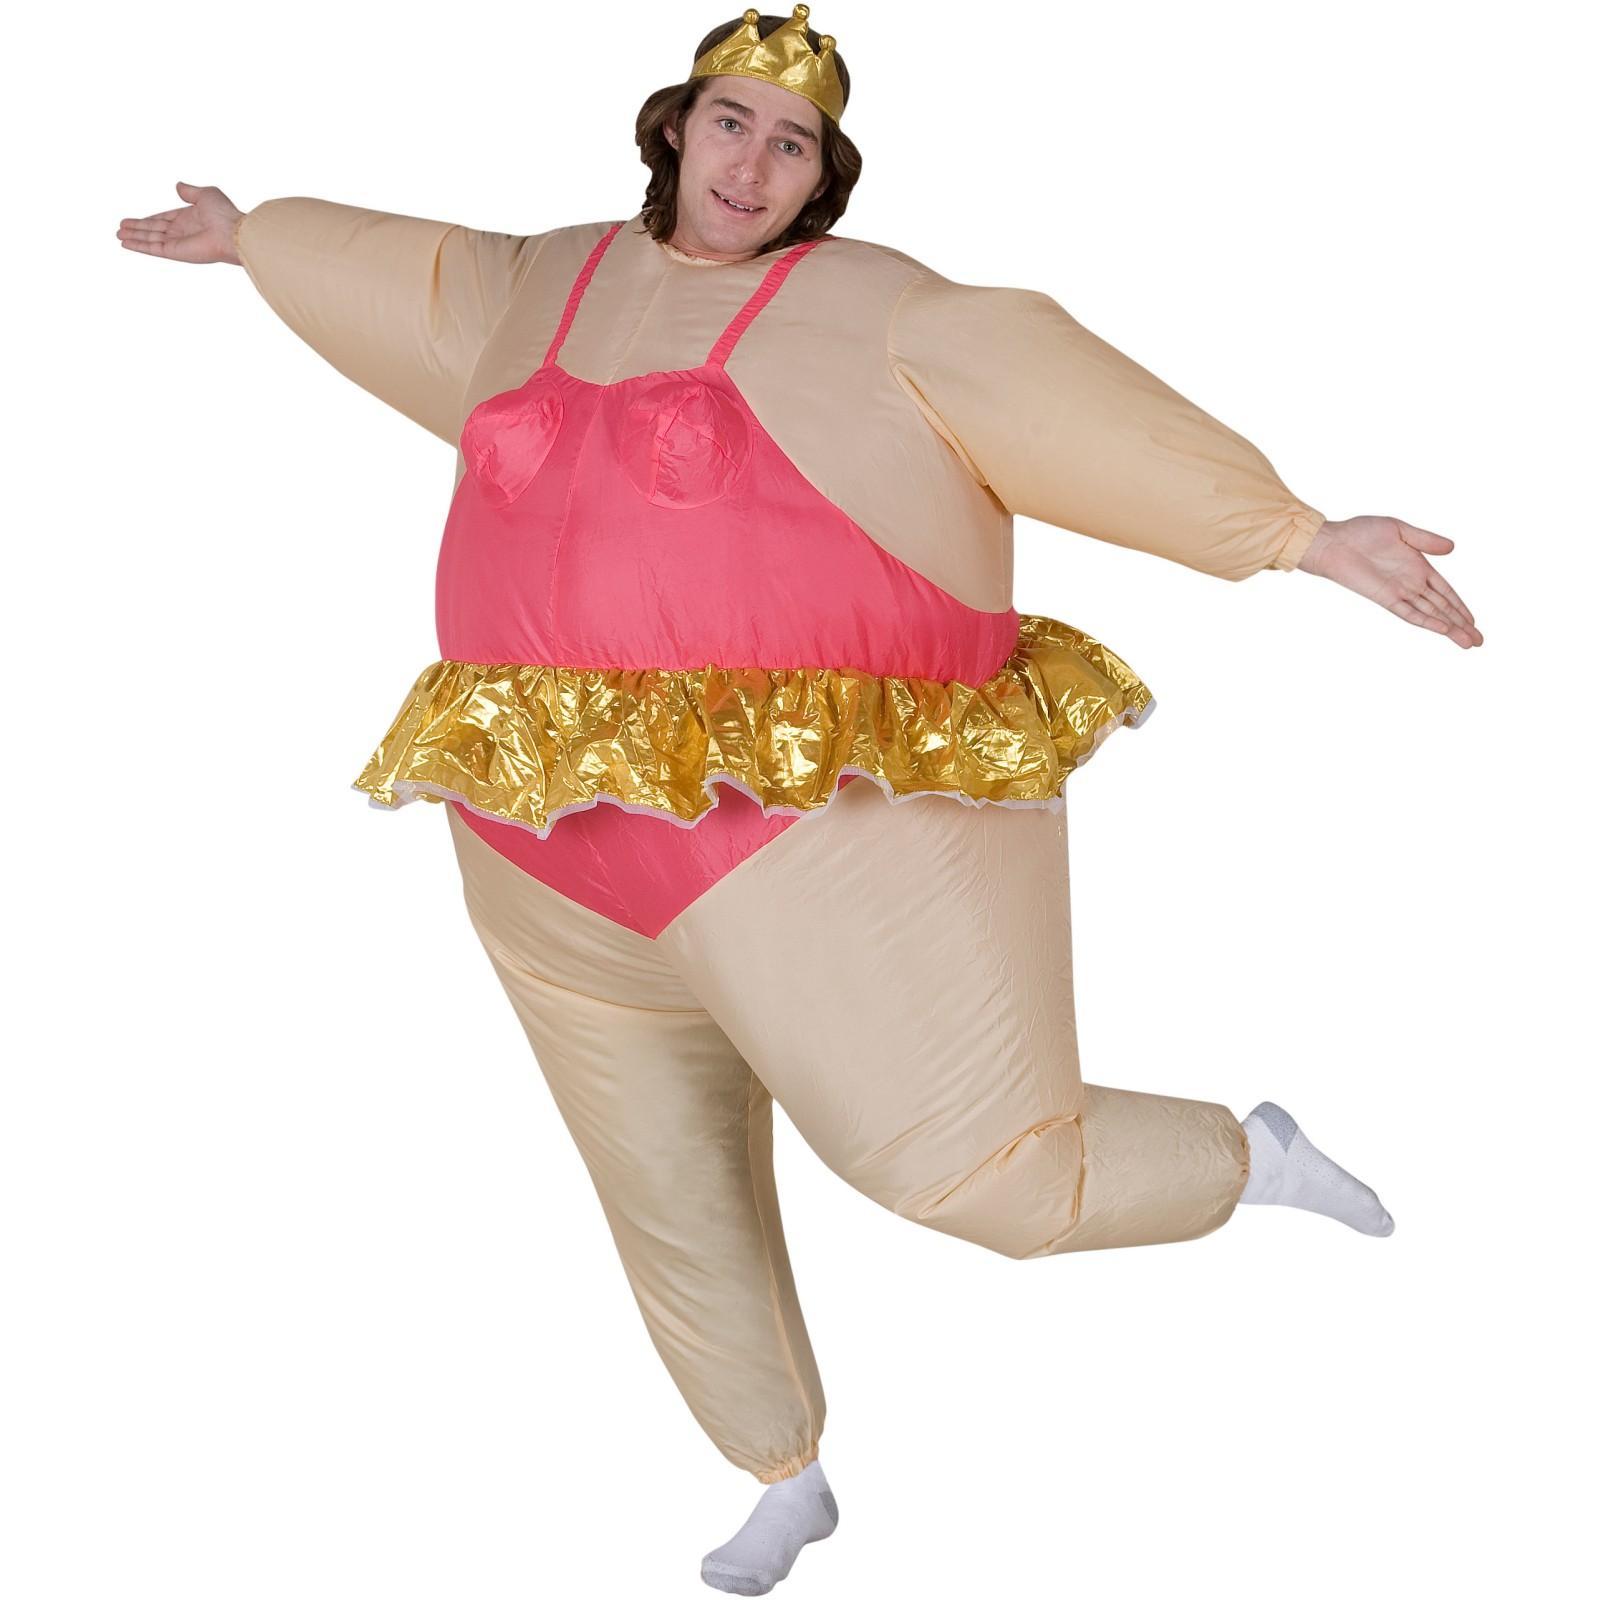 inflatable-ballerina-adult-costume-bc-31977.jpg